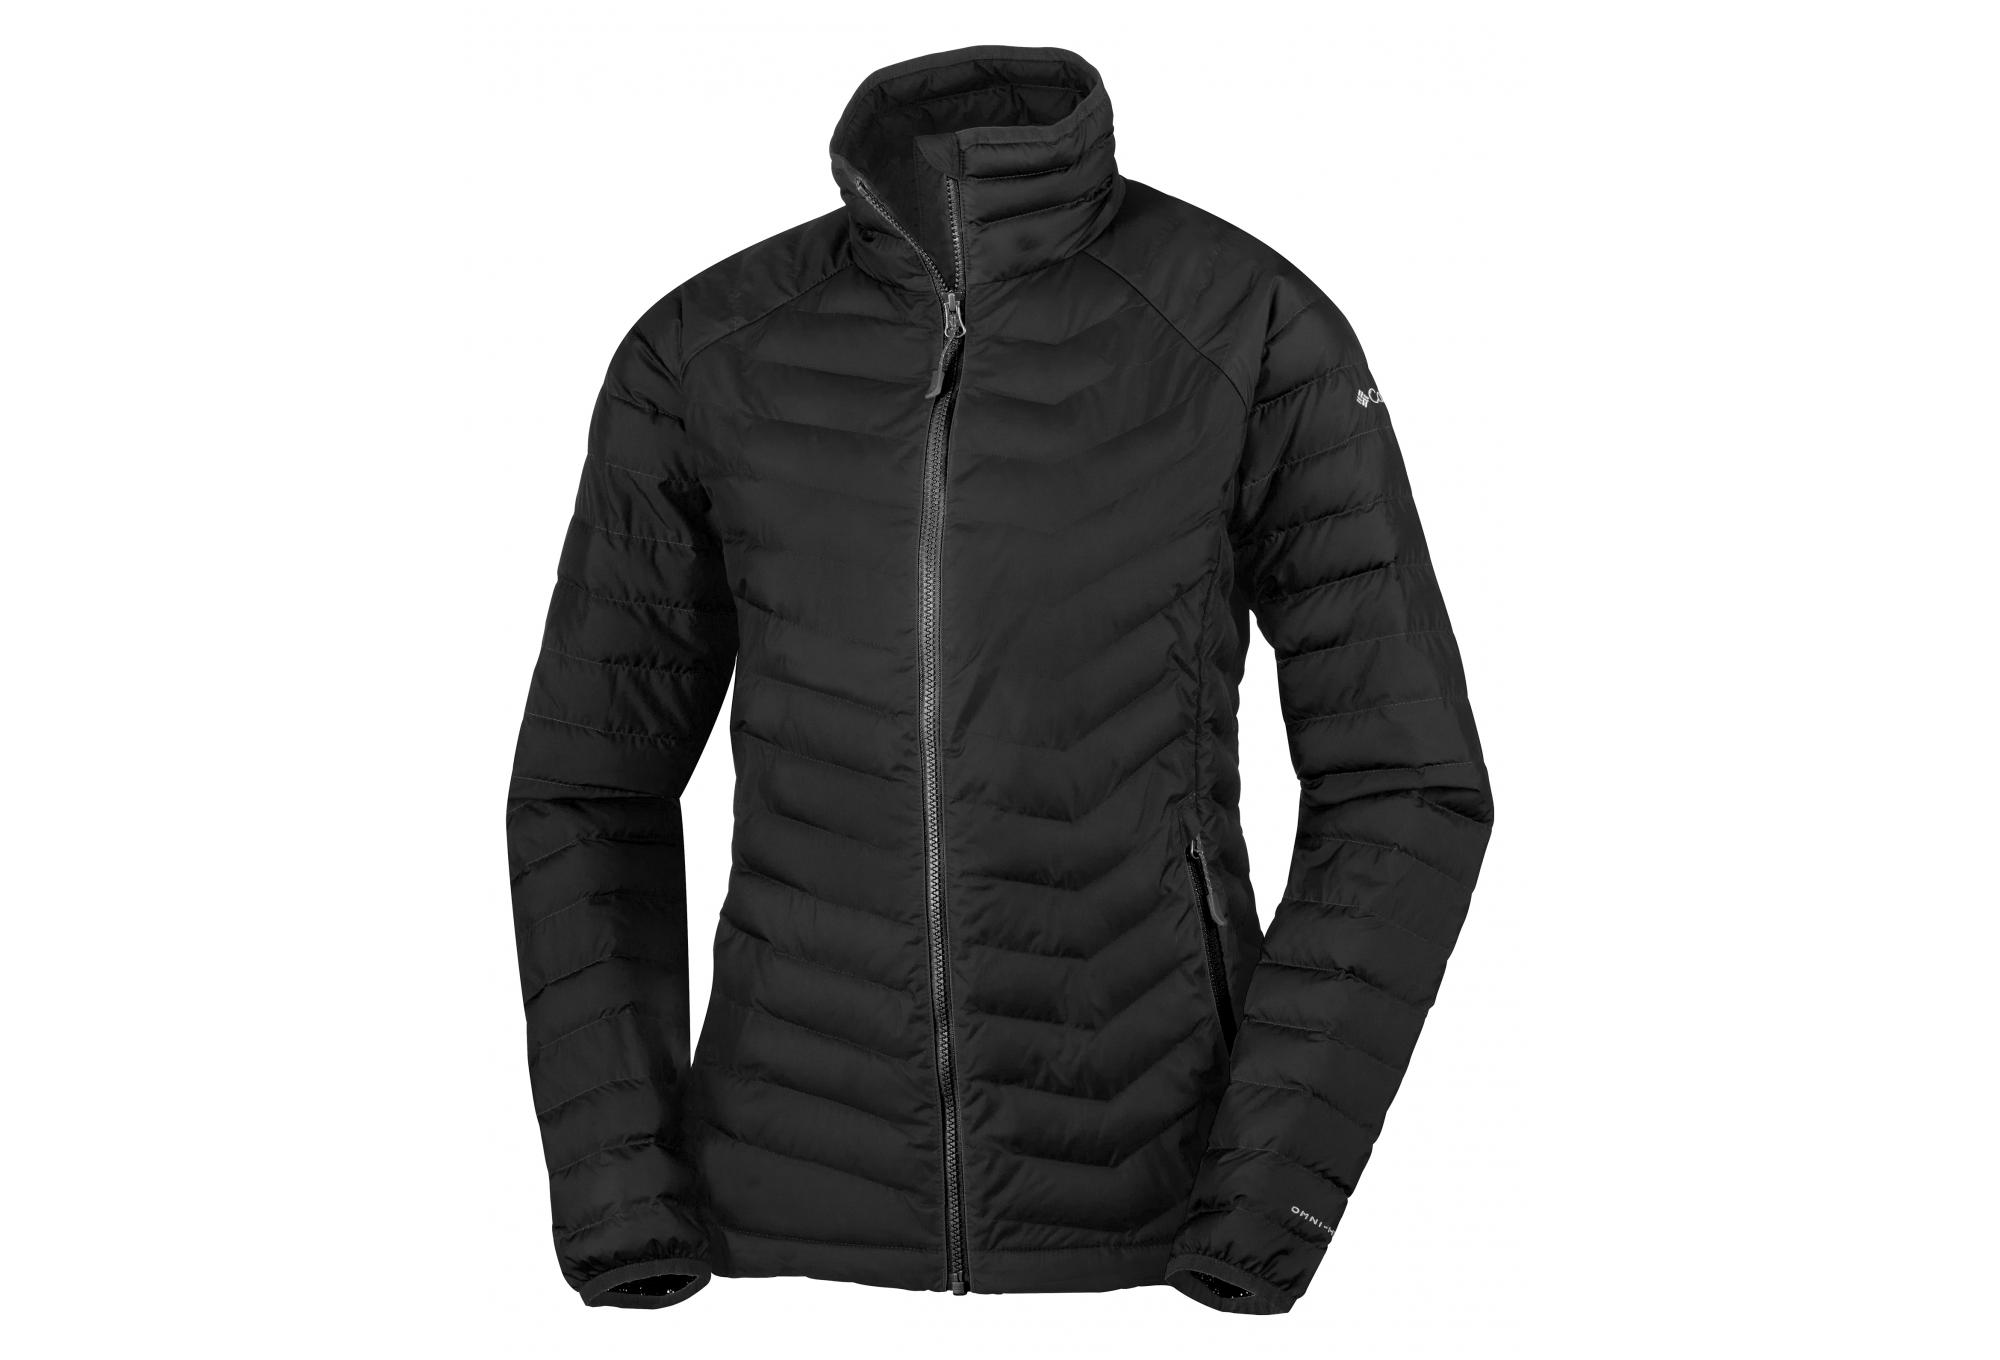 columbia powder lite jacket review